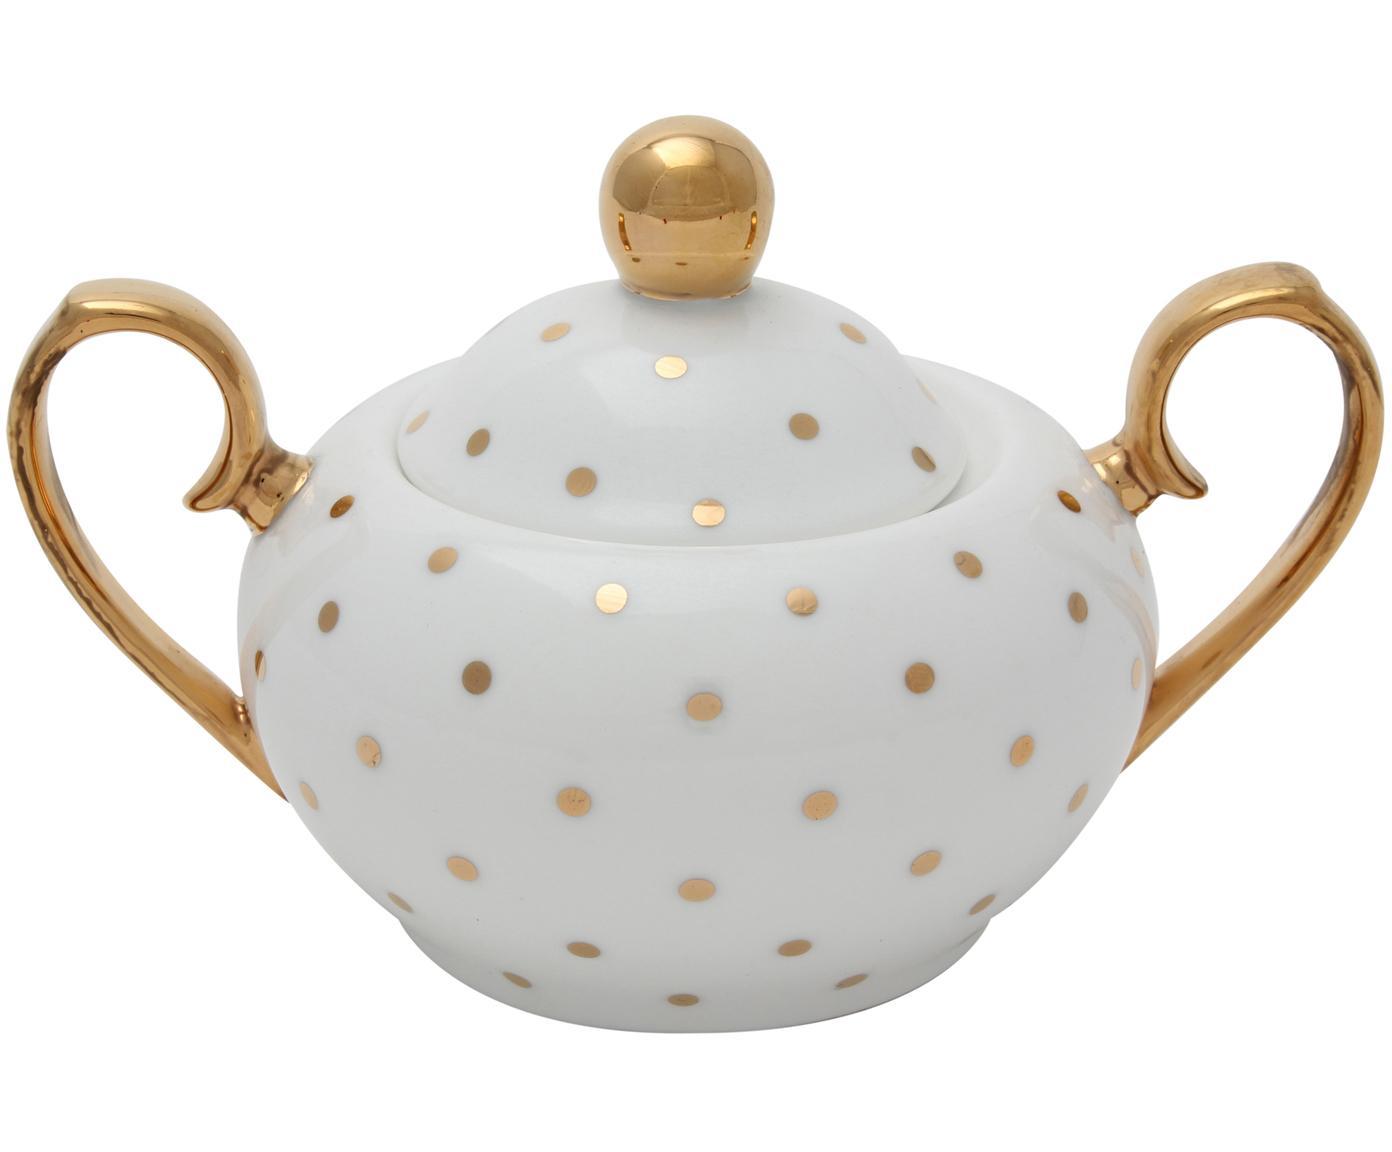 Zuccheriera Miss Golightly, Porcellana cinese, dorato, Bianco, dorato, Ø 9 x Alt. 8 cm